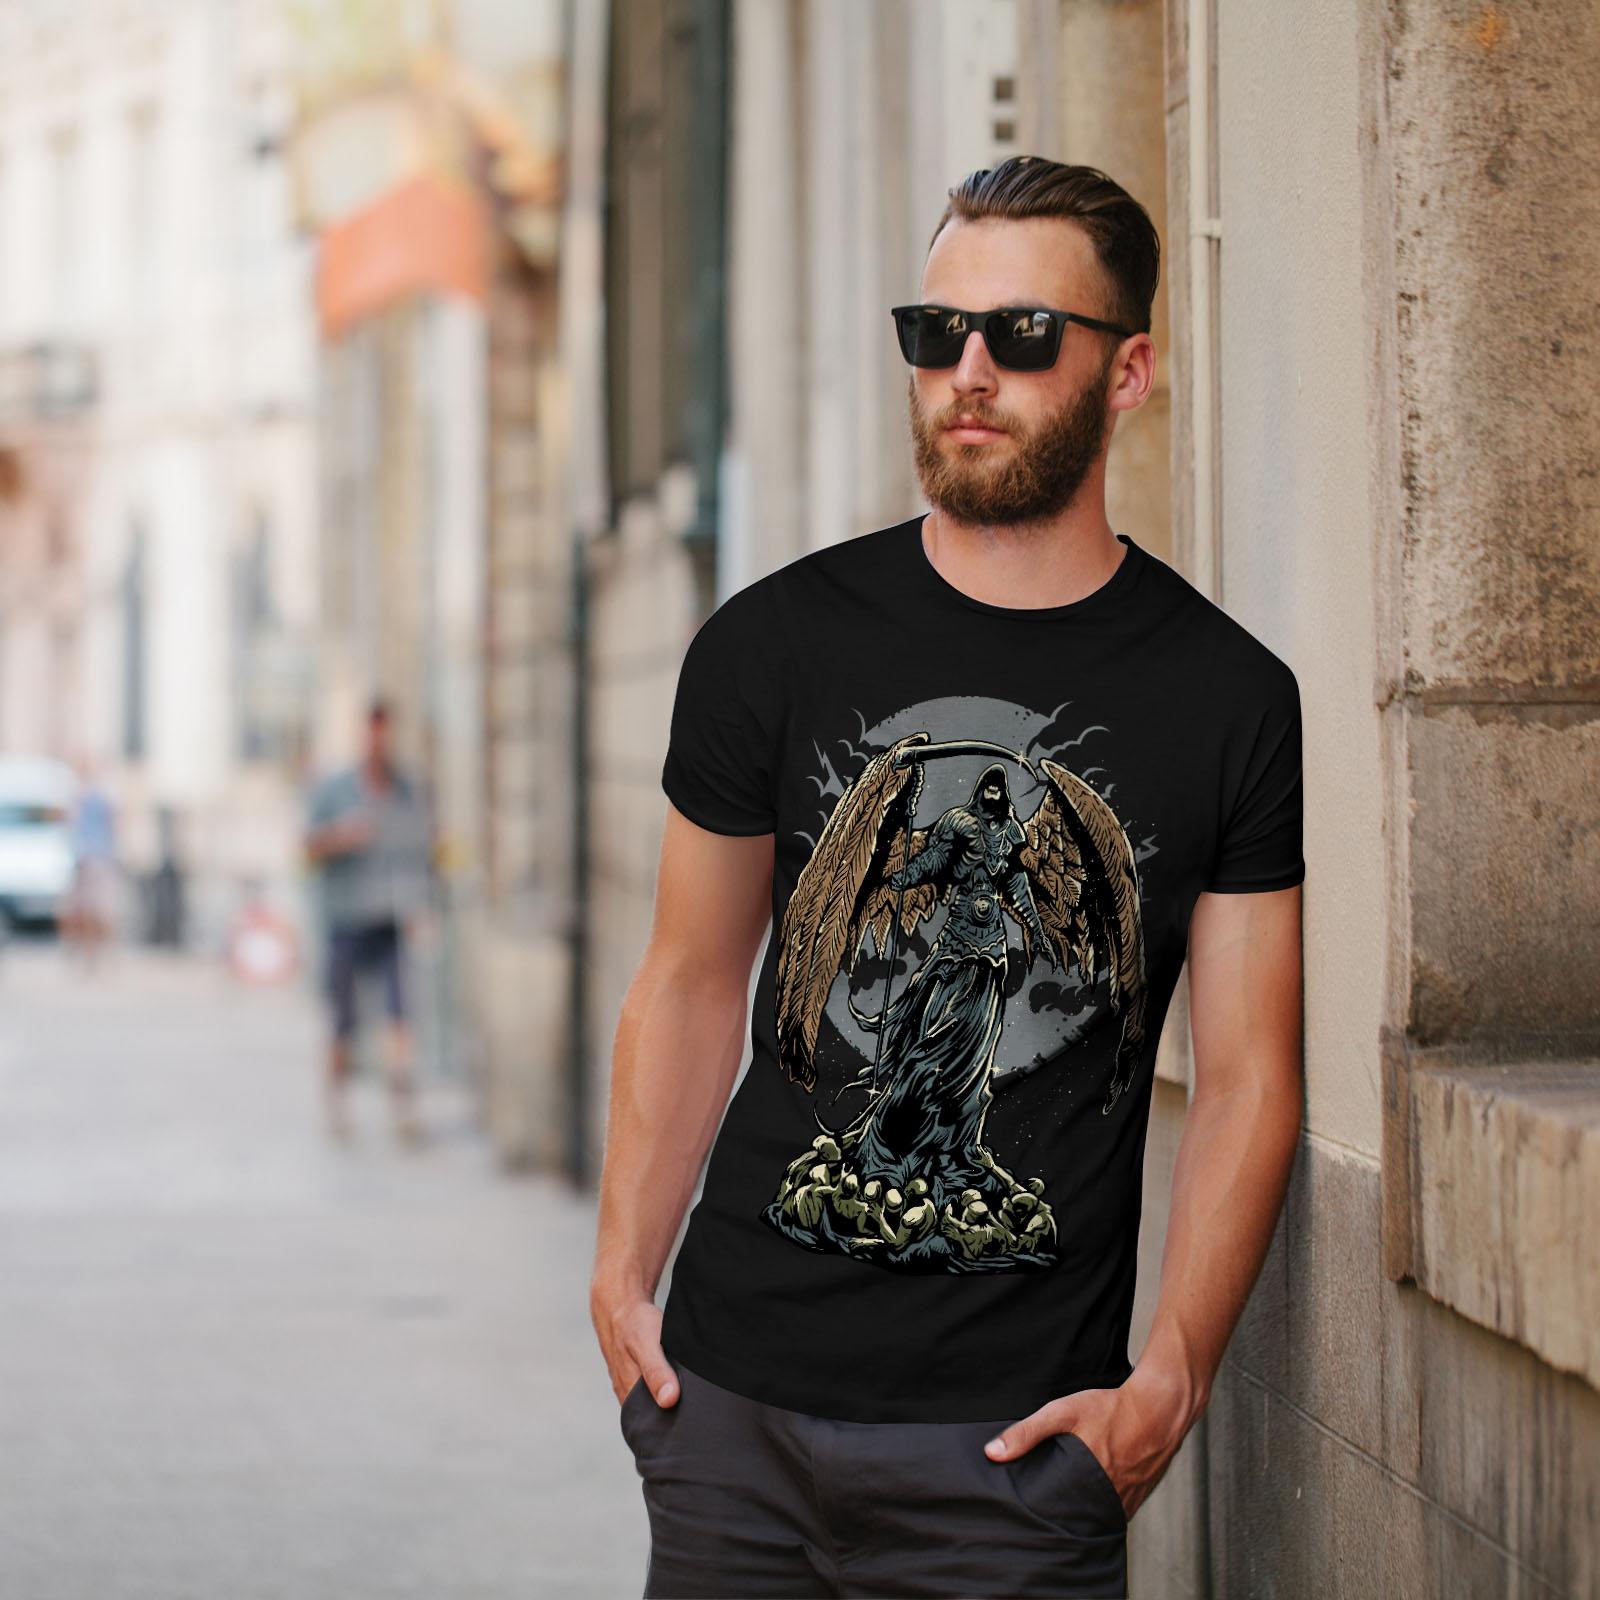 Wellcoda-Evil-Grim-Reaper-Mens-T-shirt-Horror-Graphic-Design-Printed-Tee thumbnail 5